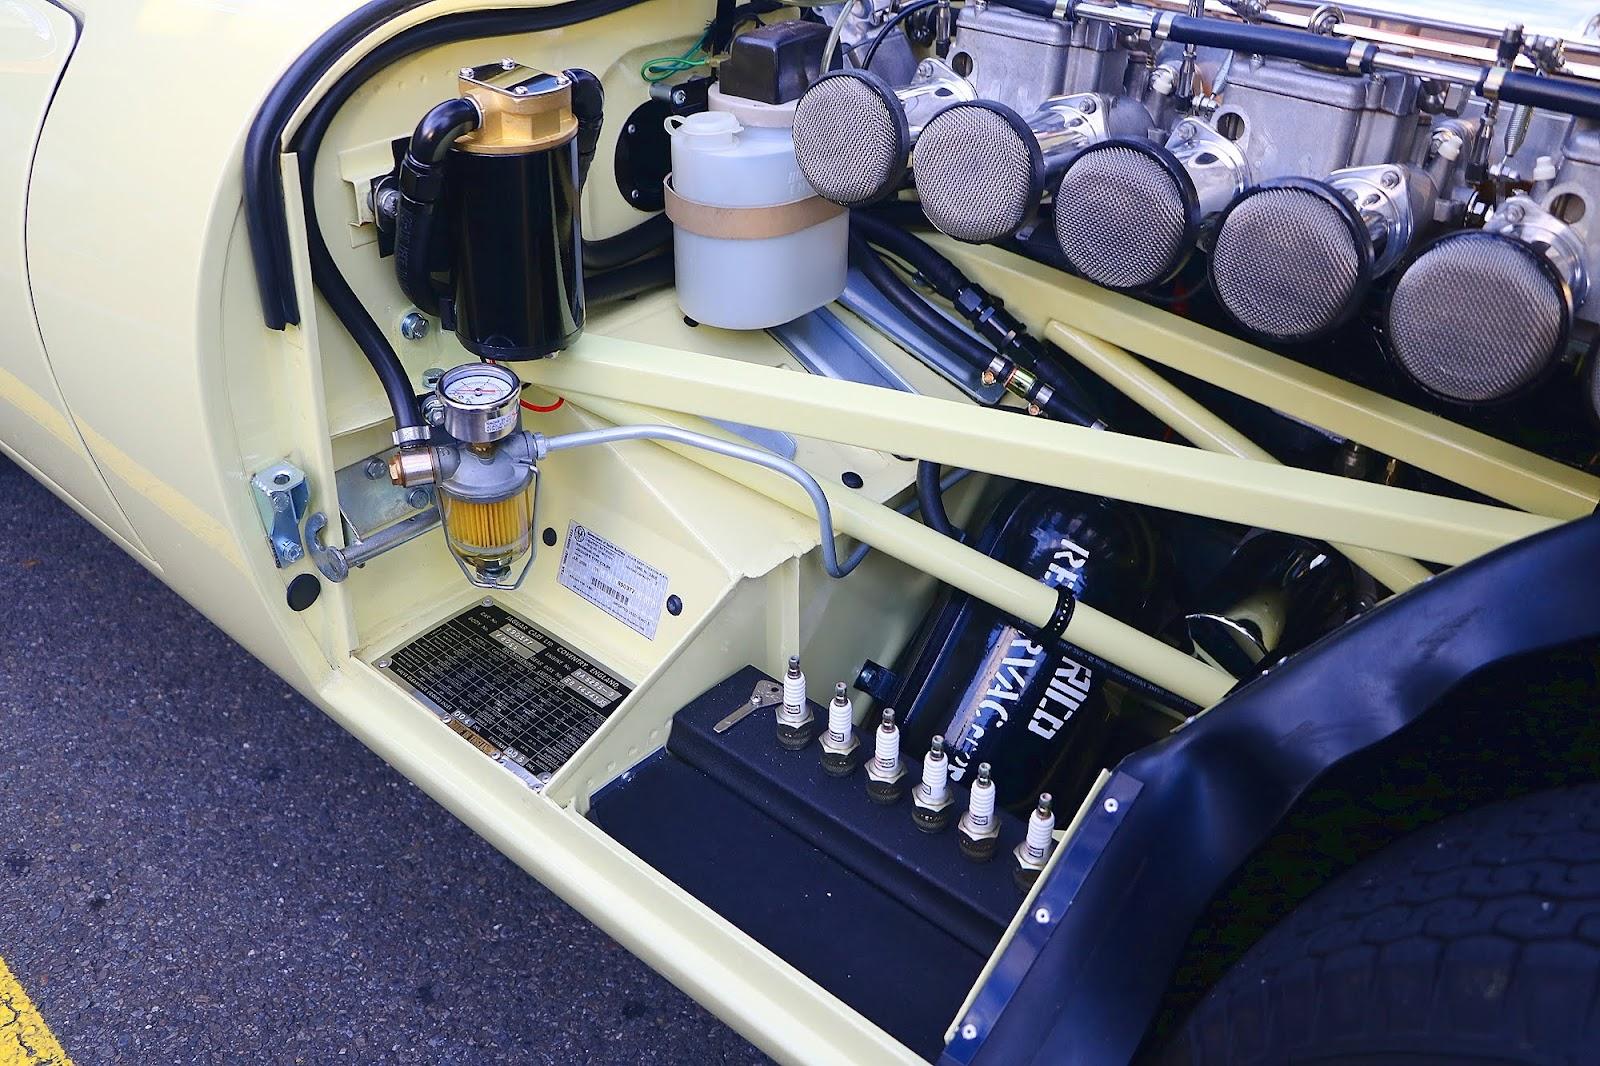 1964 Jaguar E-Type 3.8 Engine Bay 4.jpg